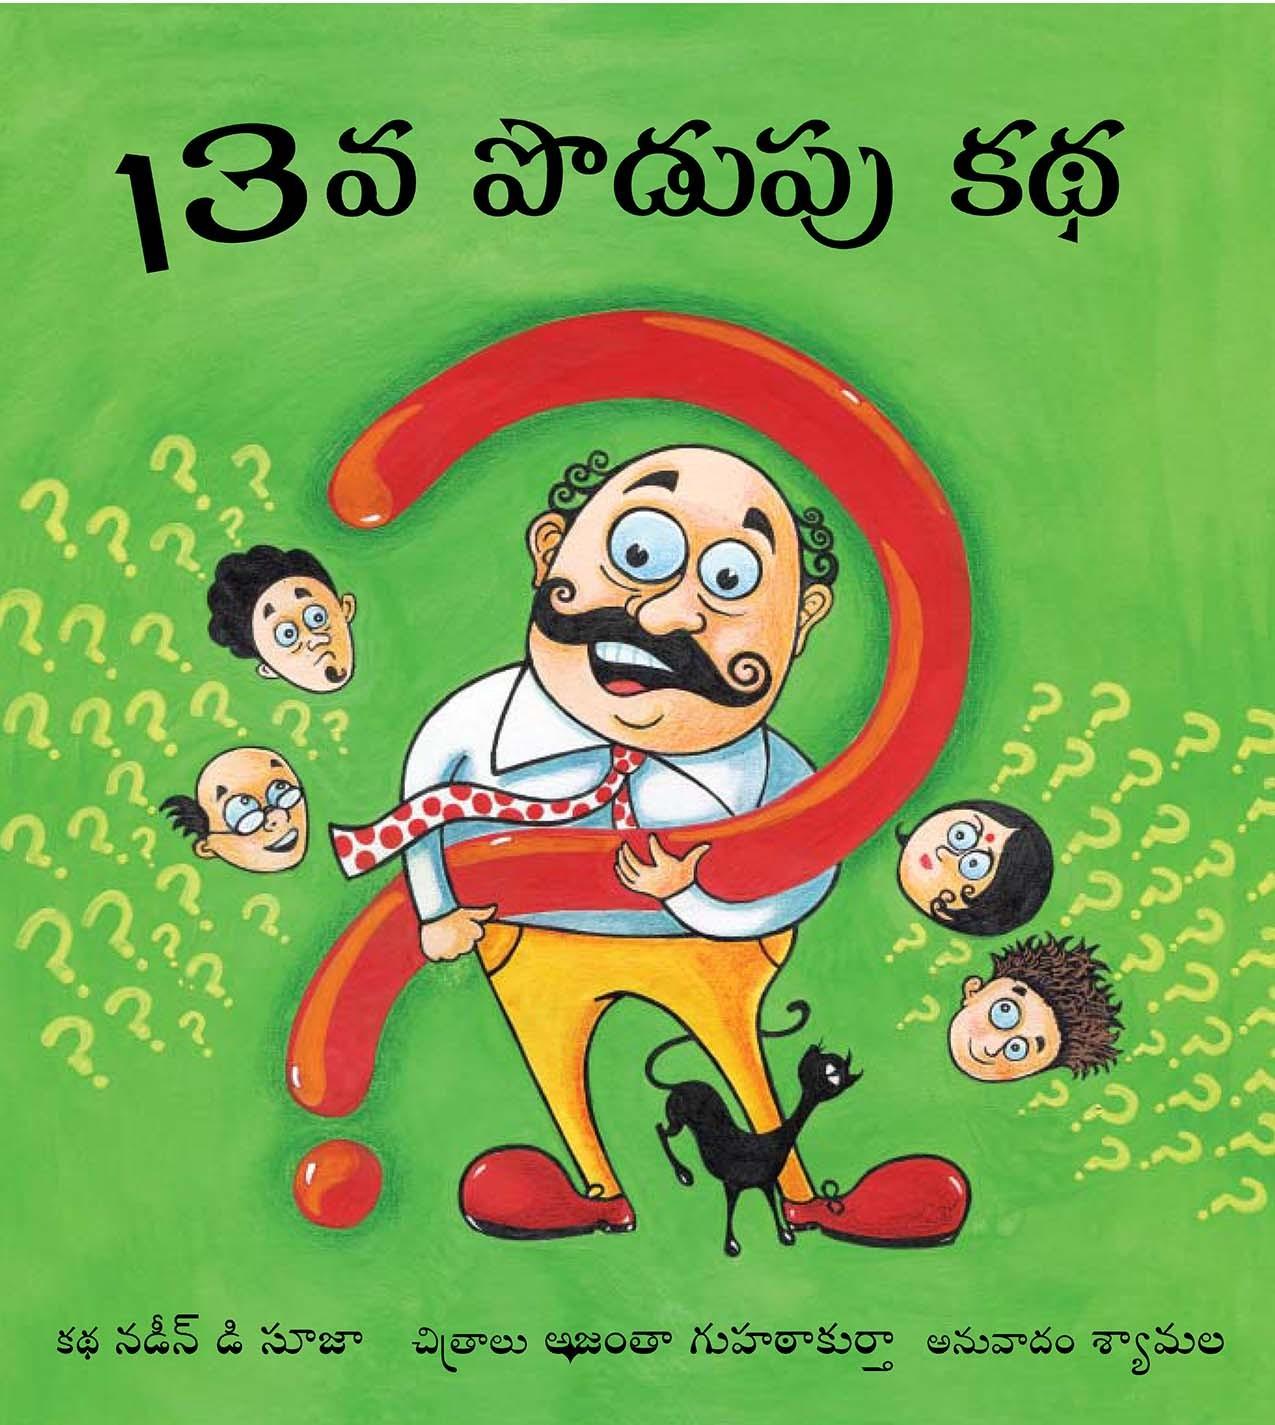 The 13th Riddle/Padamoodava Podupu Kadha (Telugu)